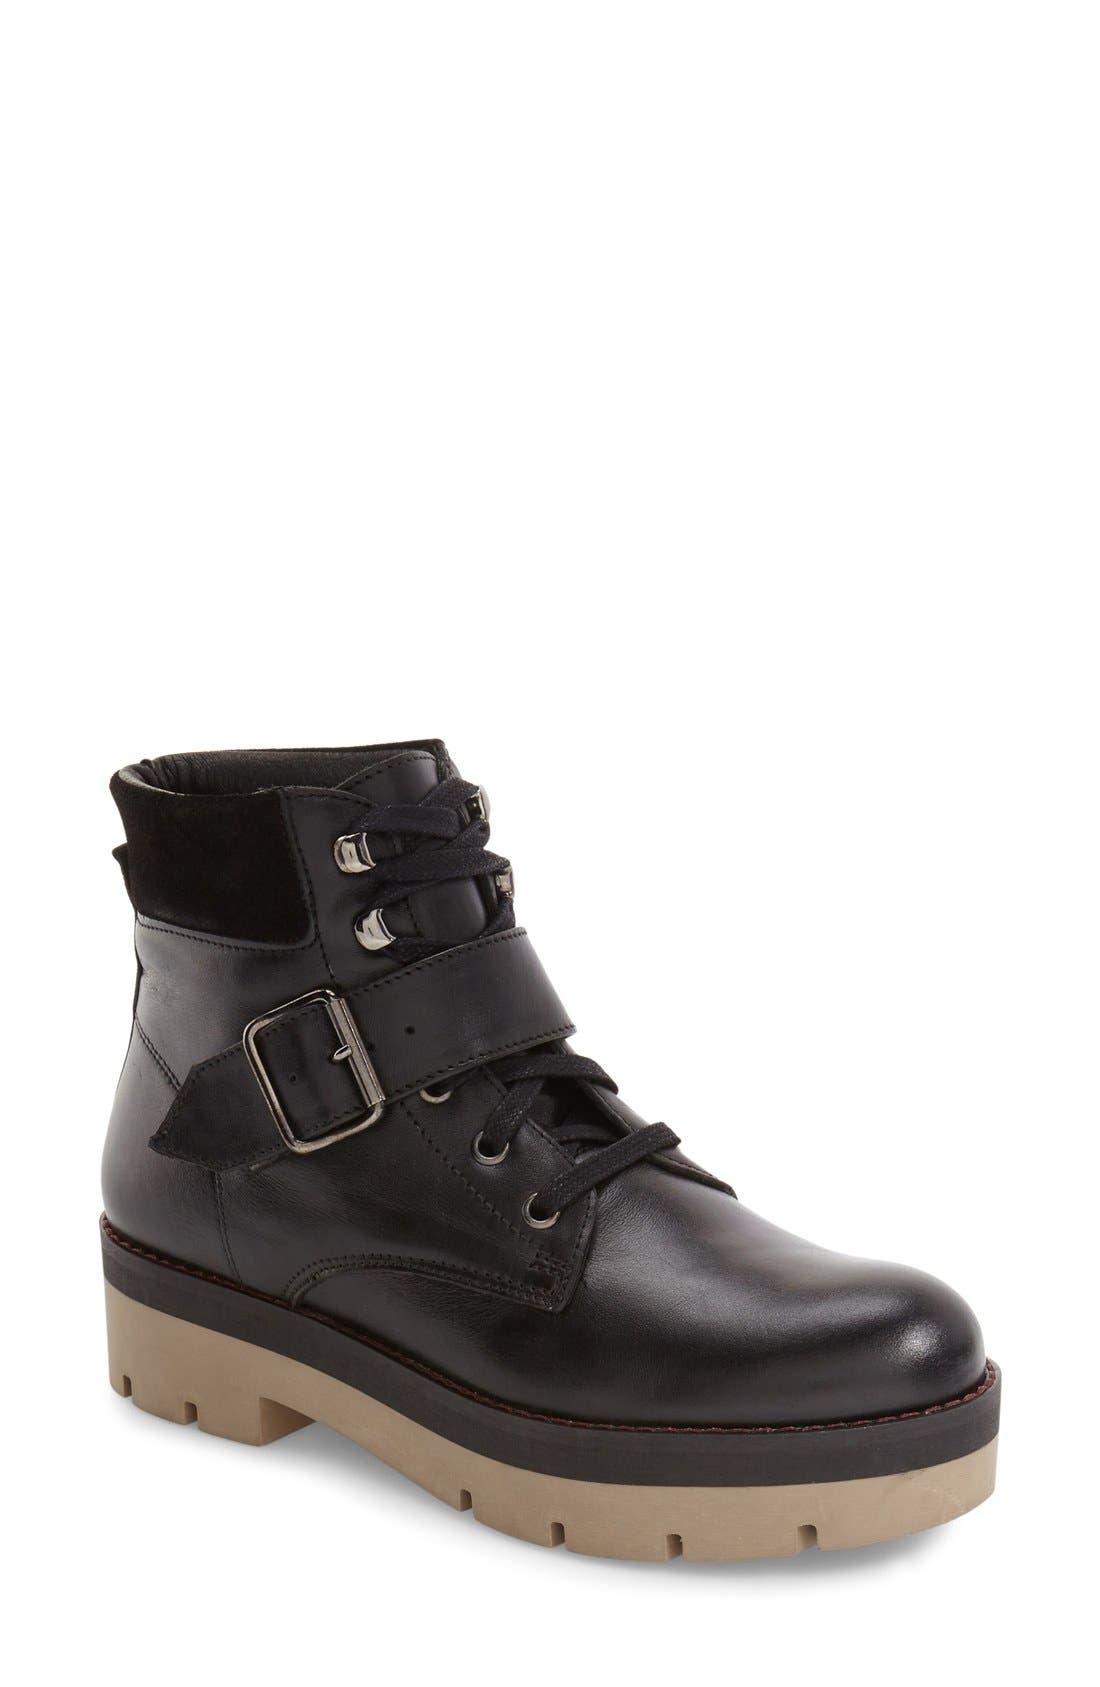 Alternate Image 1 Selected - Topshop Autumn Platform Boot (Women)